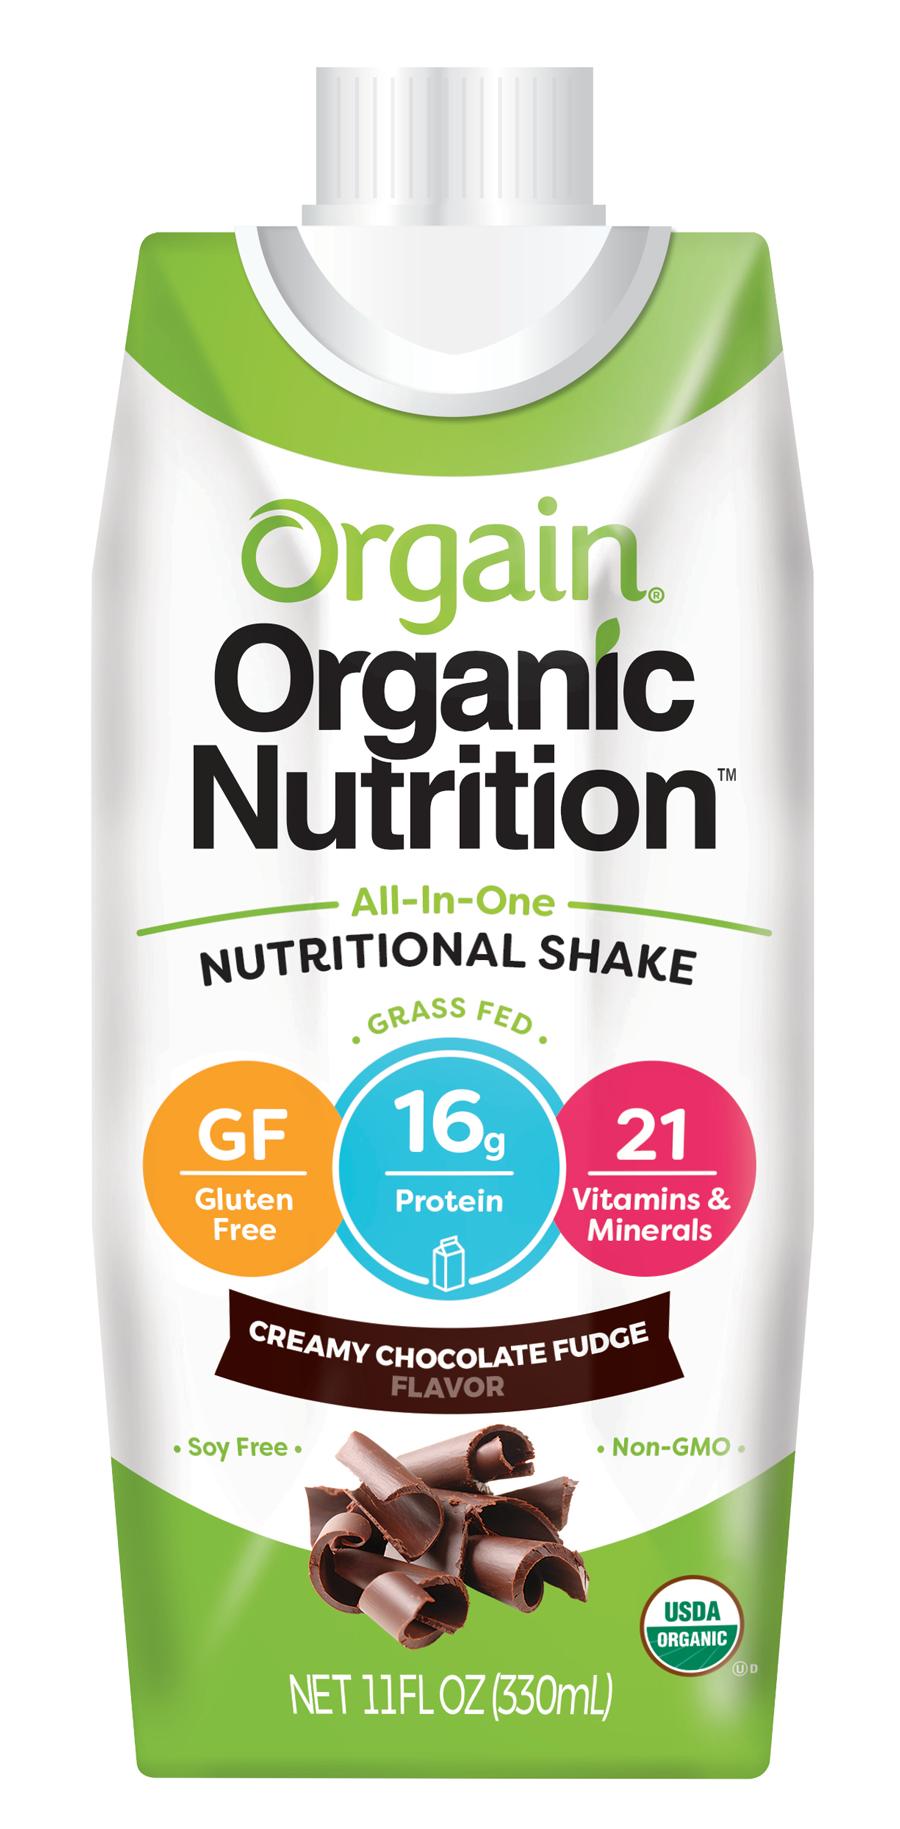 Healthy Office Drinks, Orgain Nutritional Shake